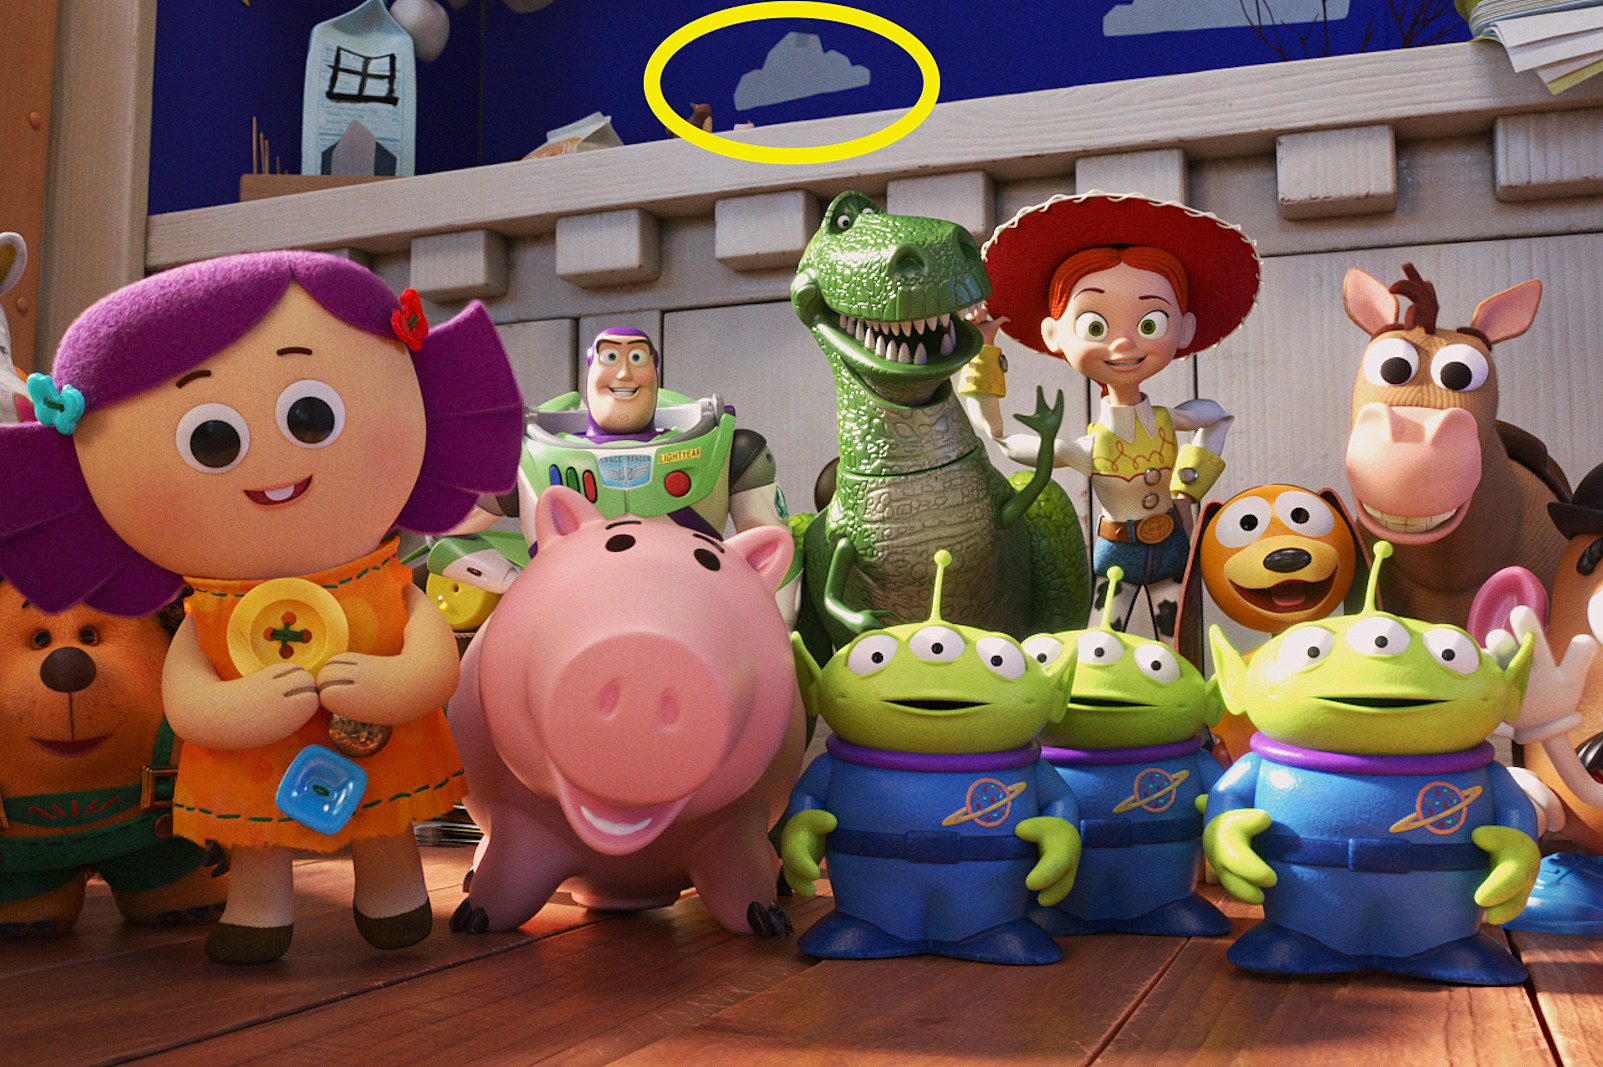 Disney Pixar It's A Celebration Series Toy Story Pin